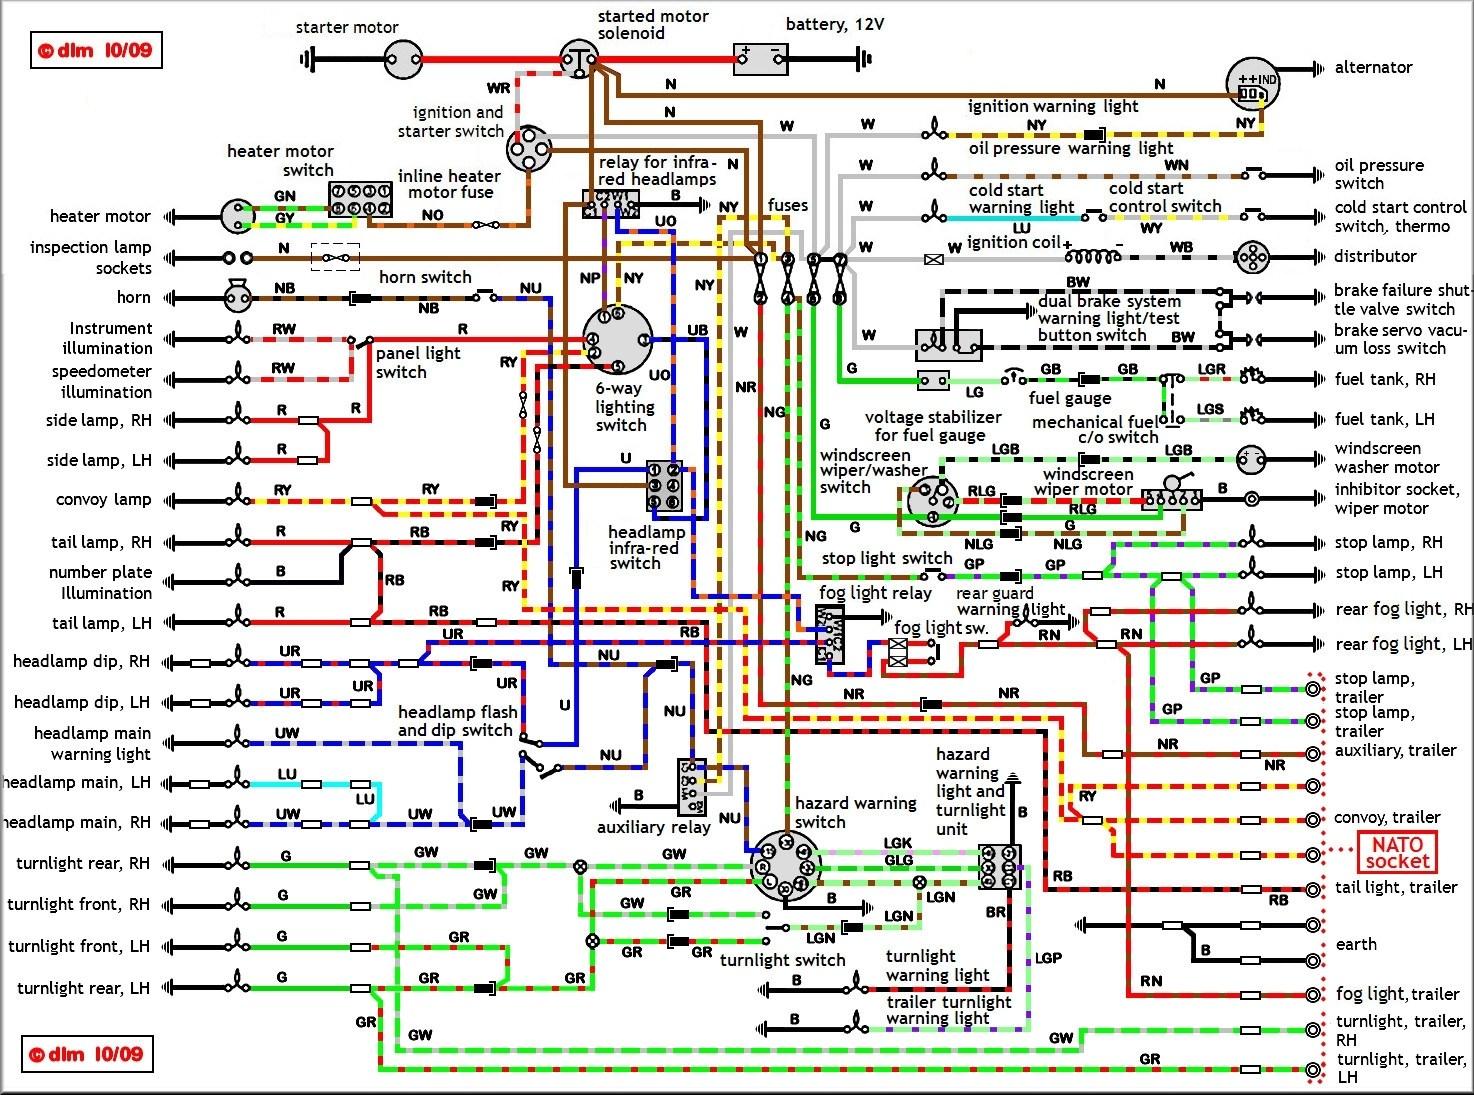 jaguar xk8 fuse box diagram eo 0336  jaguar s type r wiring diagram 2001 jaguar xk8 fuse box diagram eo 0336  jaguar s type r wiring diagram